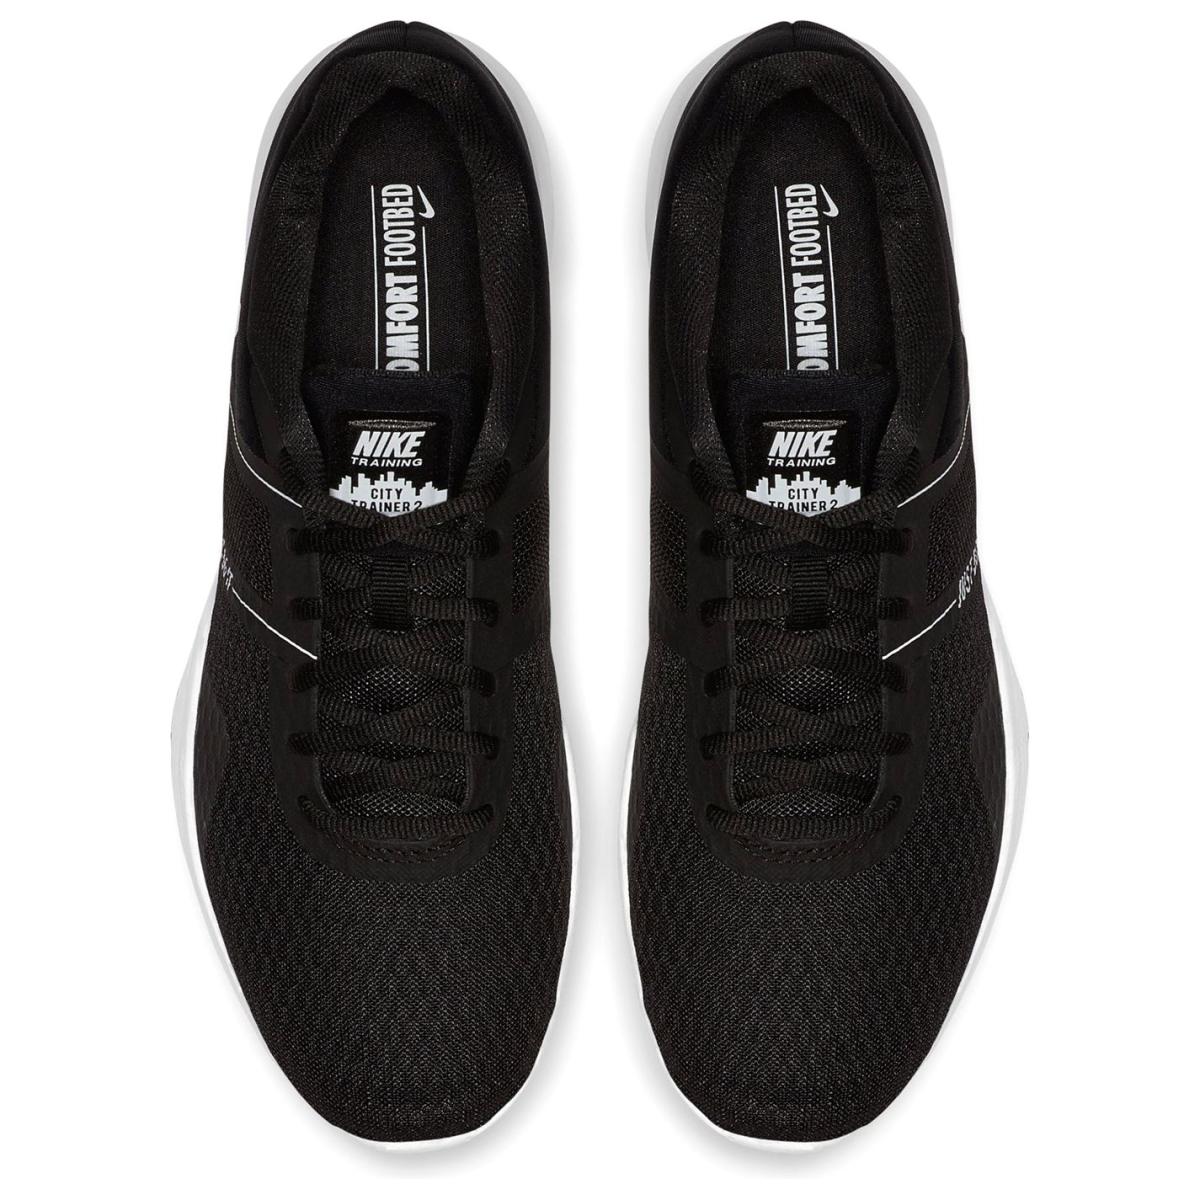 Nike-City-Trainer-2-Turnschuhe-Laufschuhe-Damen-Sportschuhe-Sneaker-3121 Indexbild 6